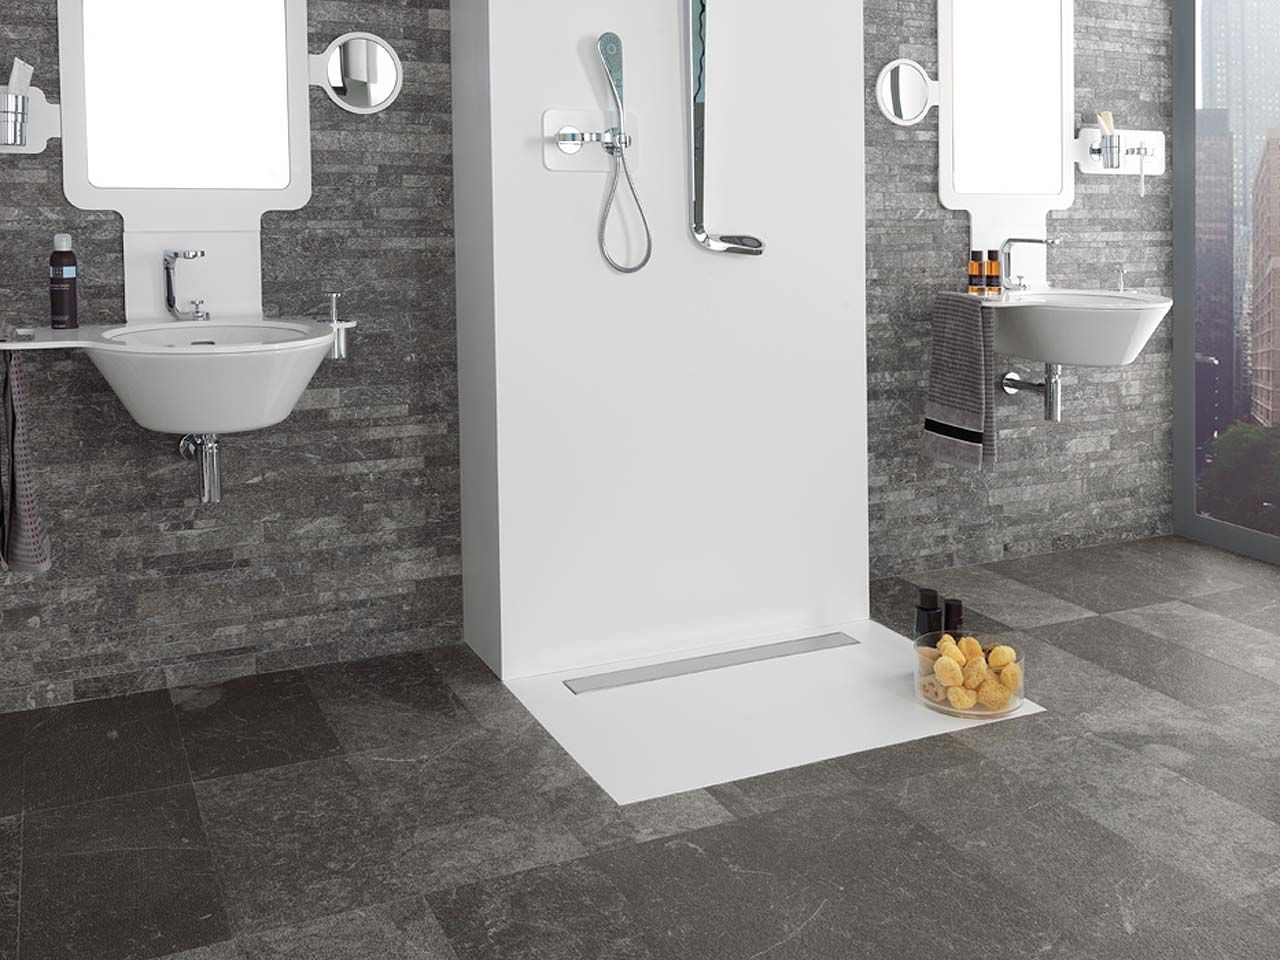 Marble natural stone floor tiles Mármol Habana Brown Lined Home ...